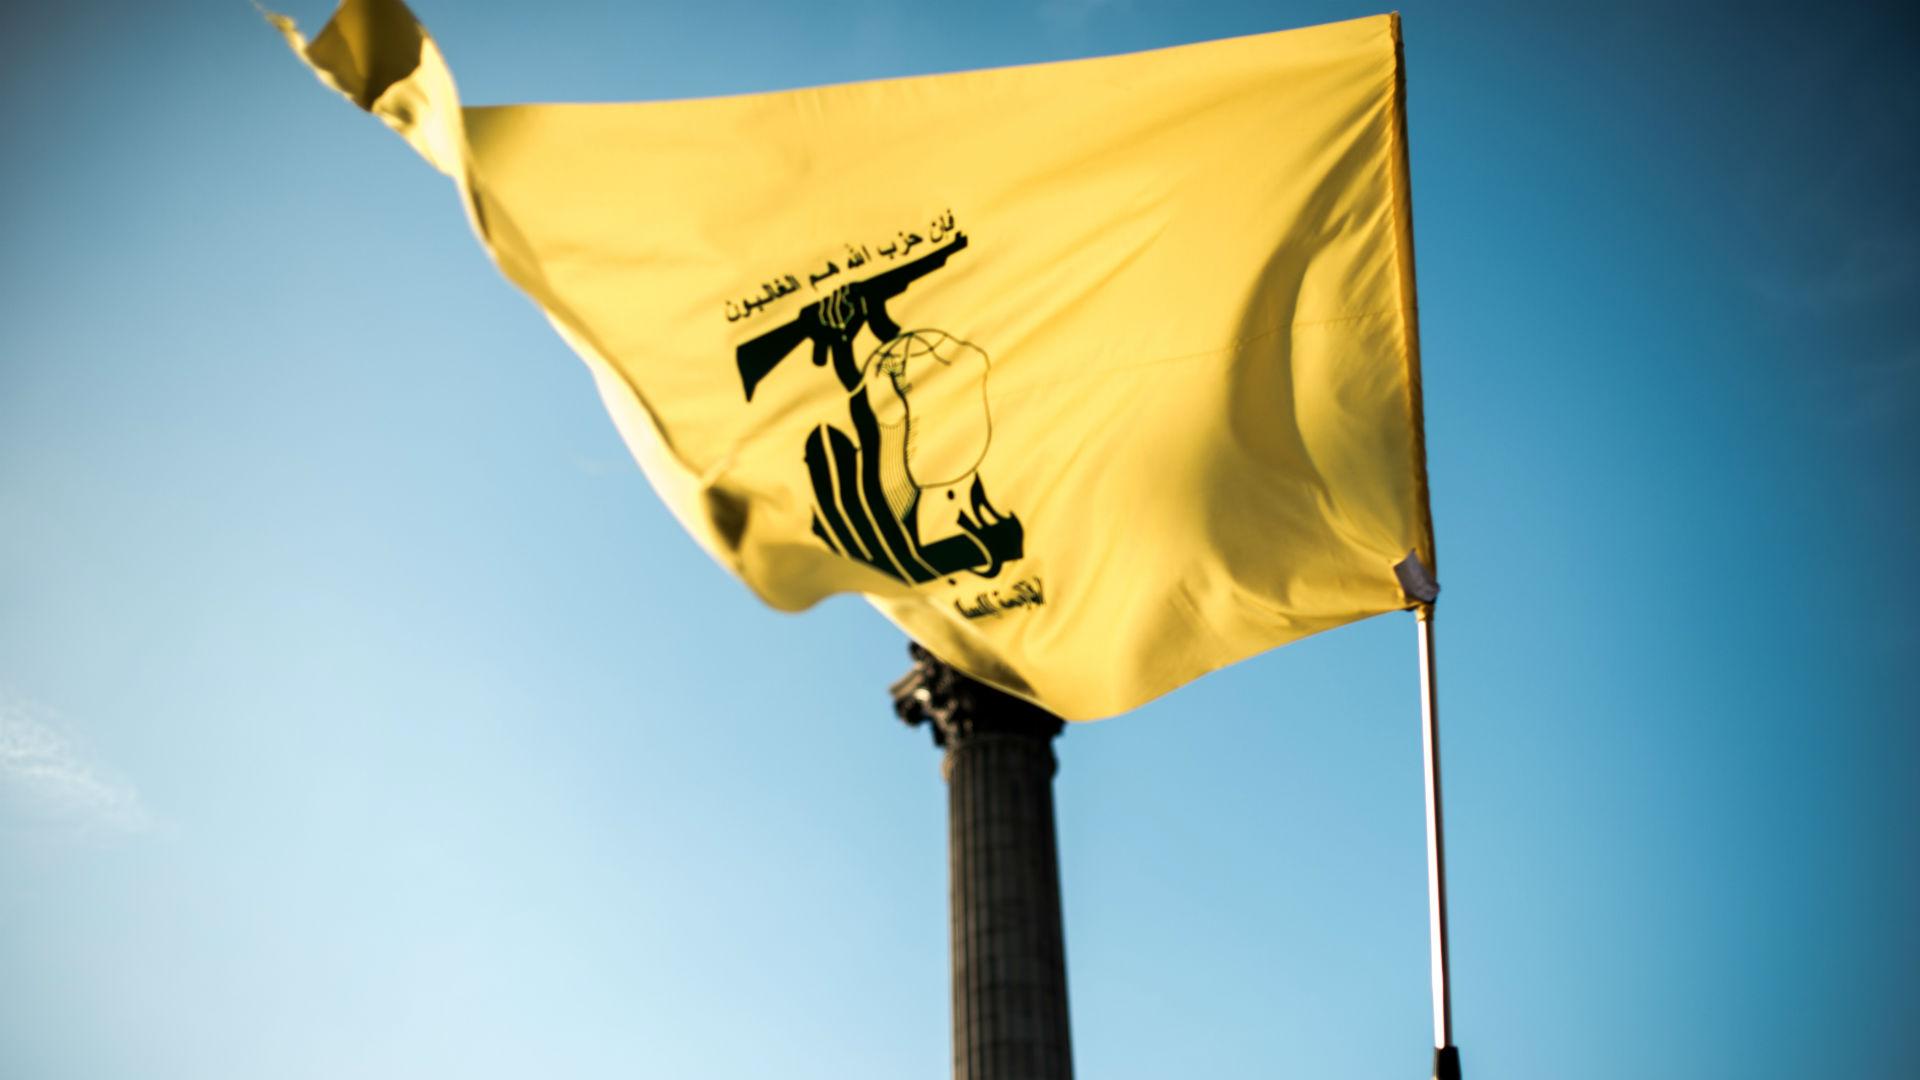 Israel praises Austria move to blacklist Hezbollah from European Union